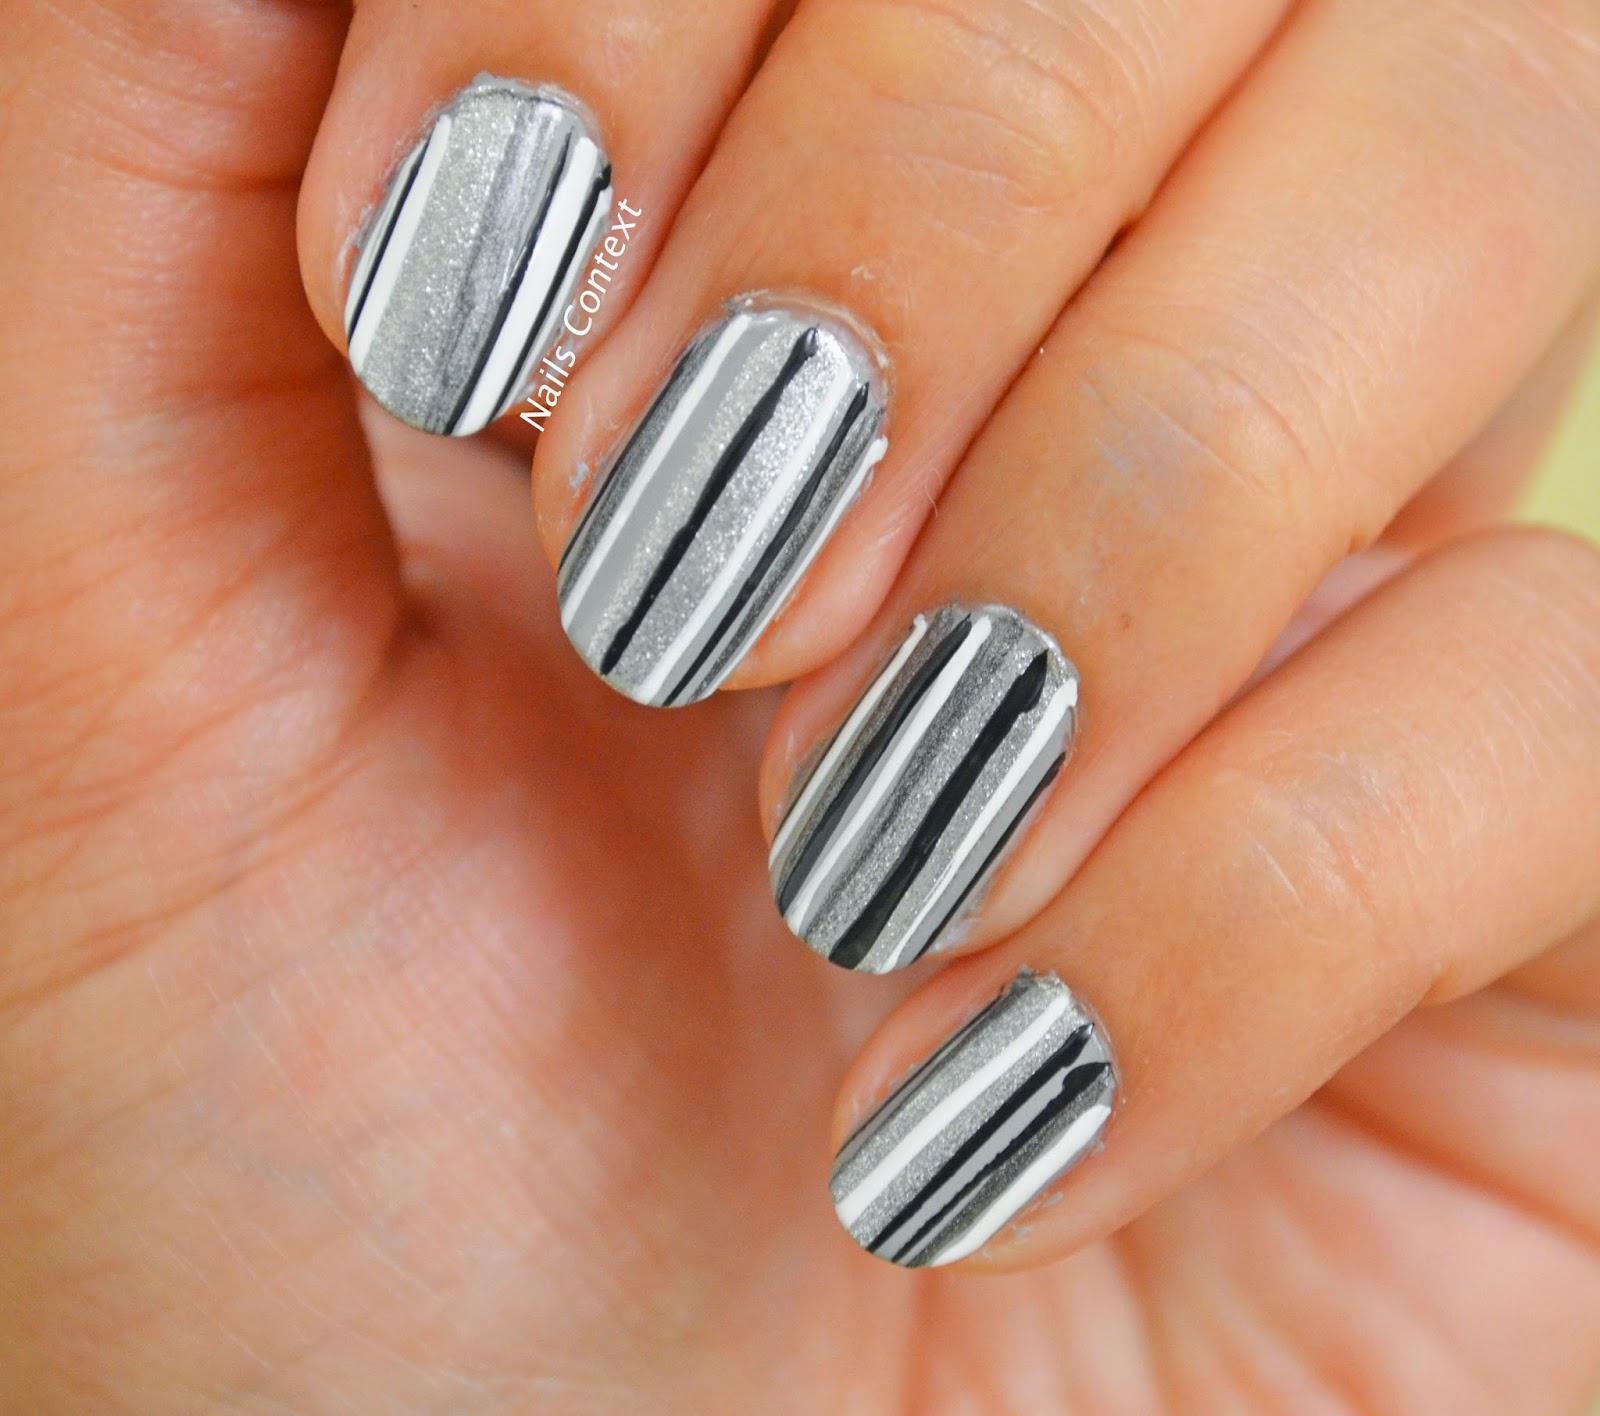 Funky Black Stripes On Nails Festooning - Nail Art Ideas - morihati.com